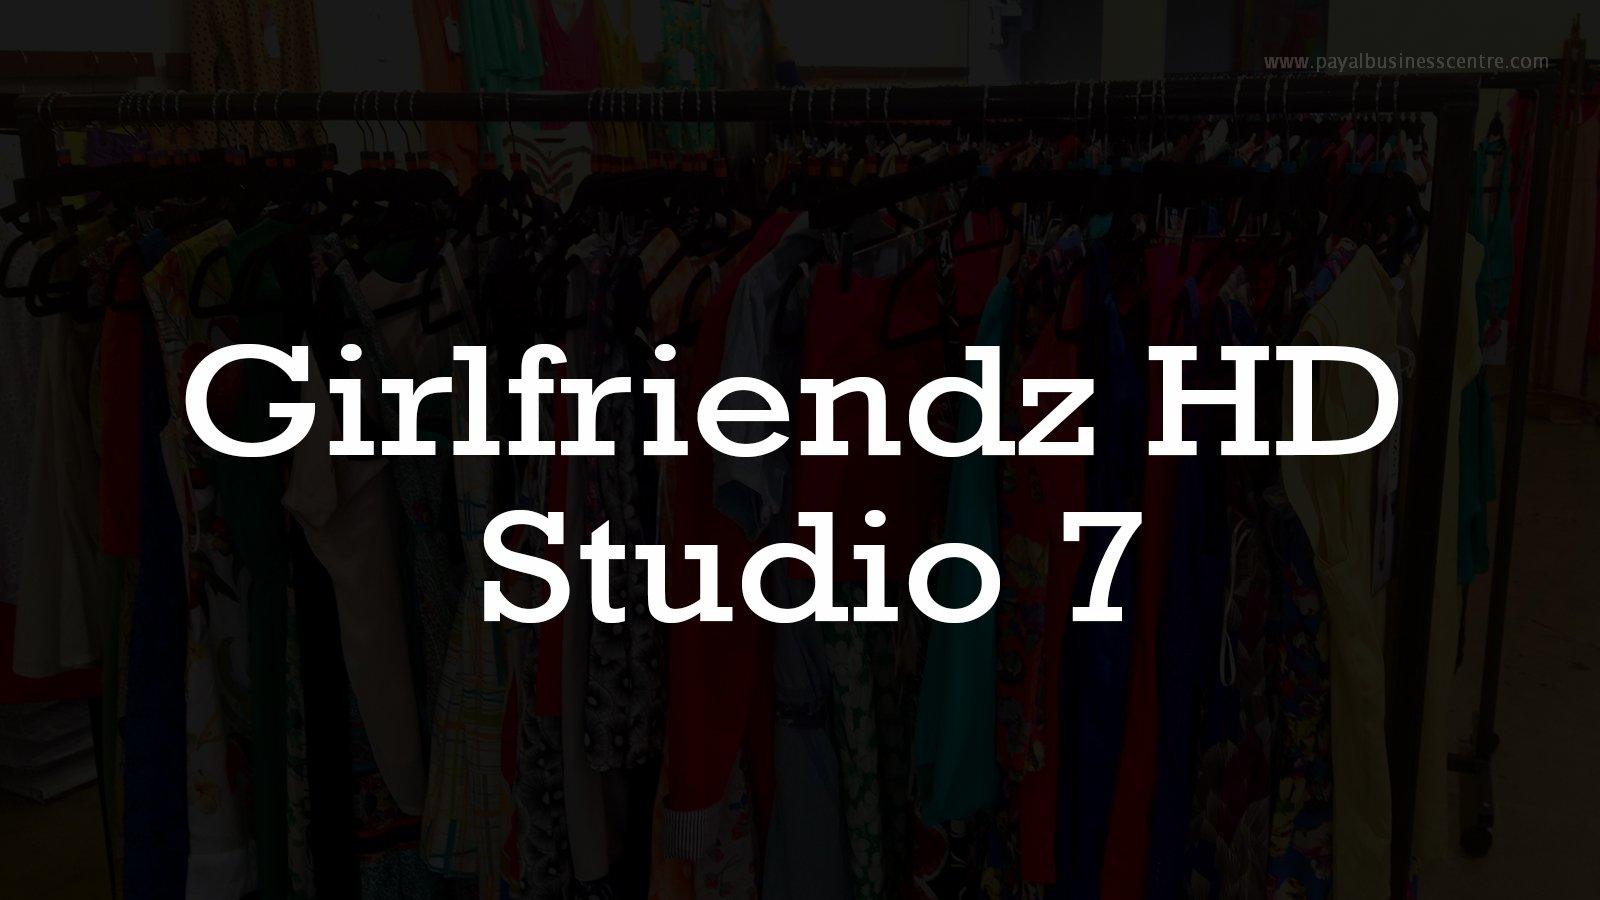 Girlfriendz HD Studio 7